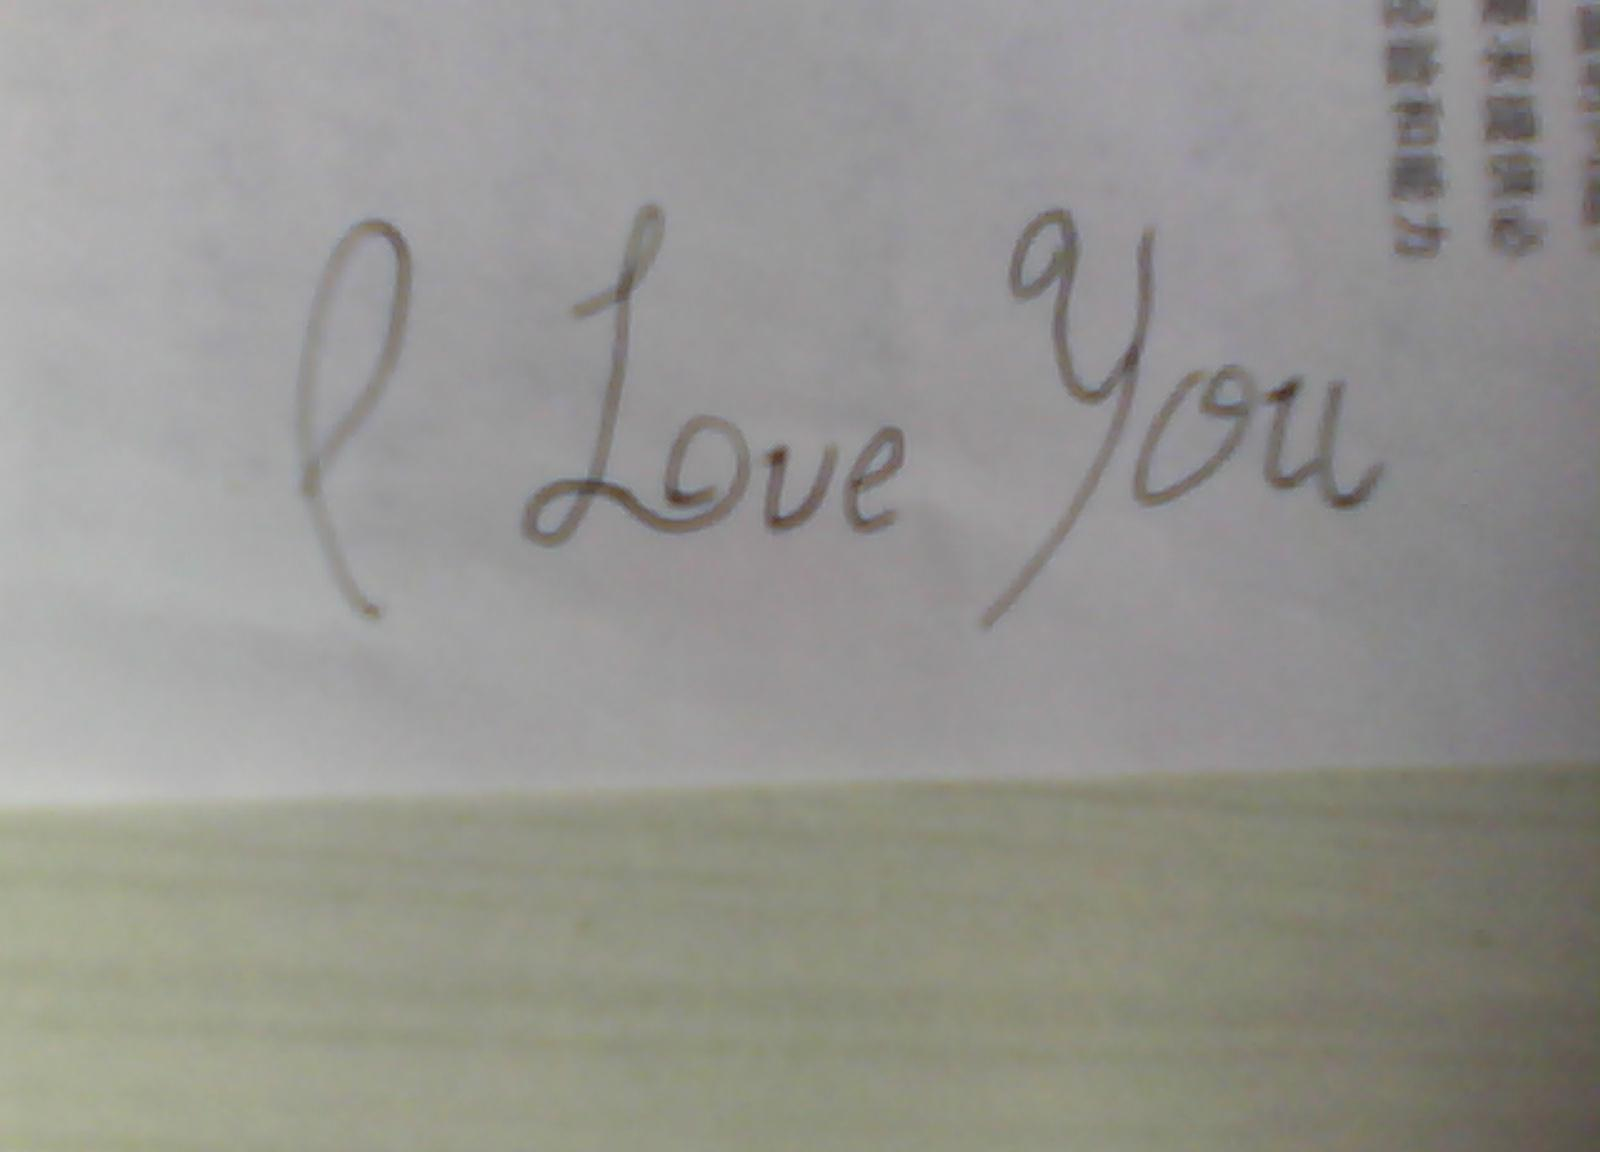 i love you怎么写才好看啊图片